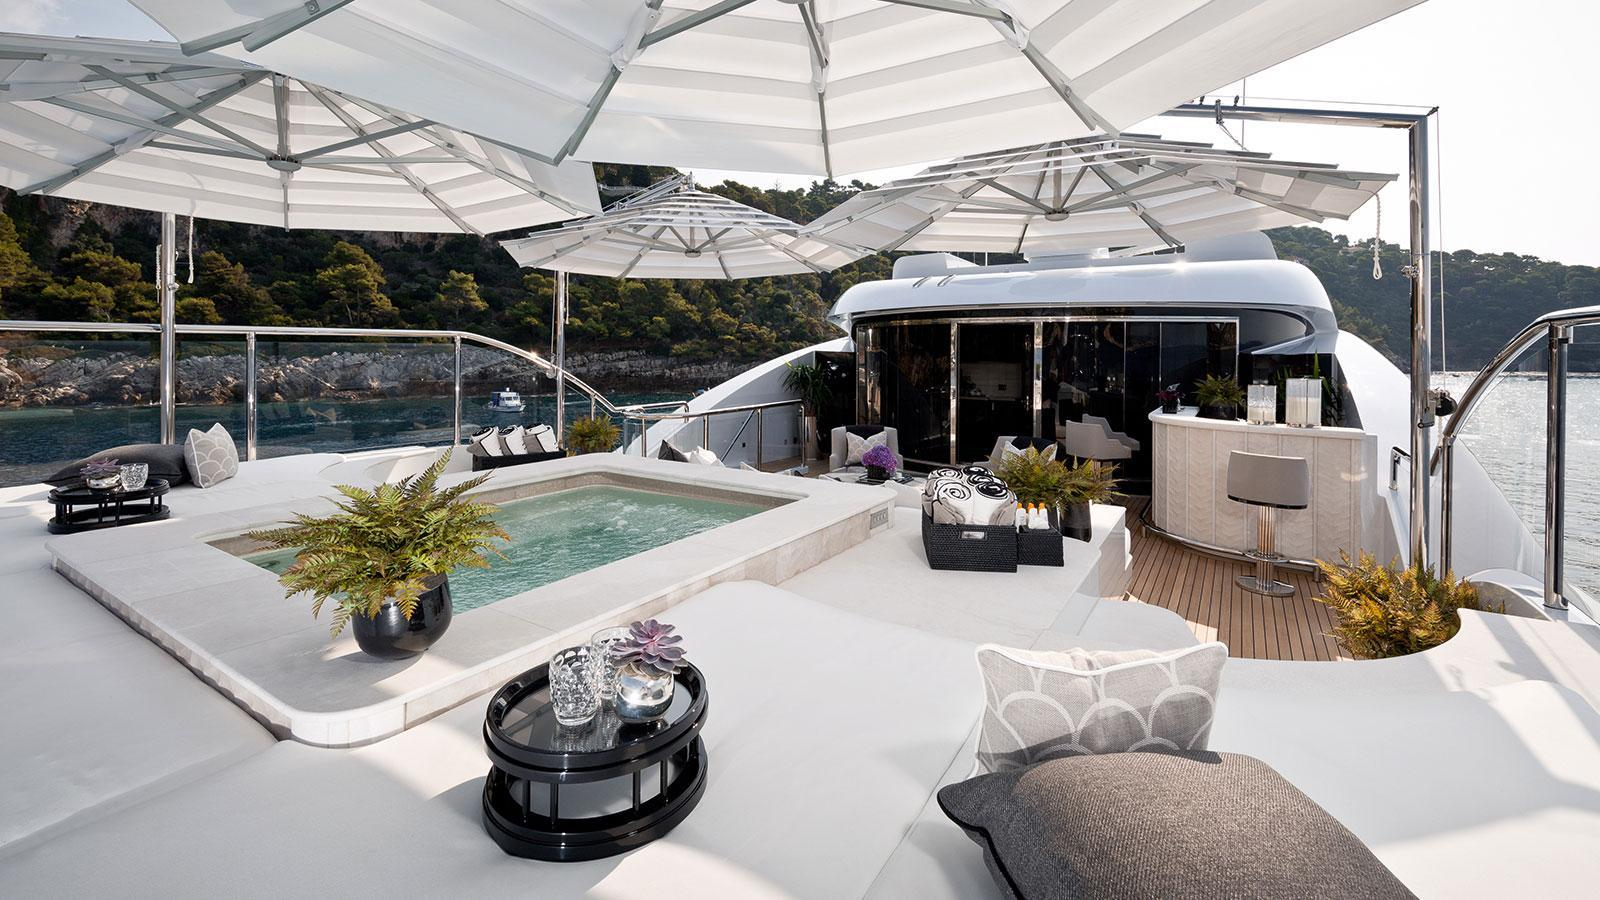 1111-motor-yacht-benetti-2015-63m-jacuzzi